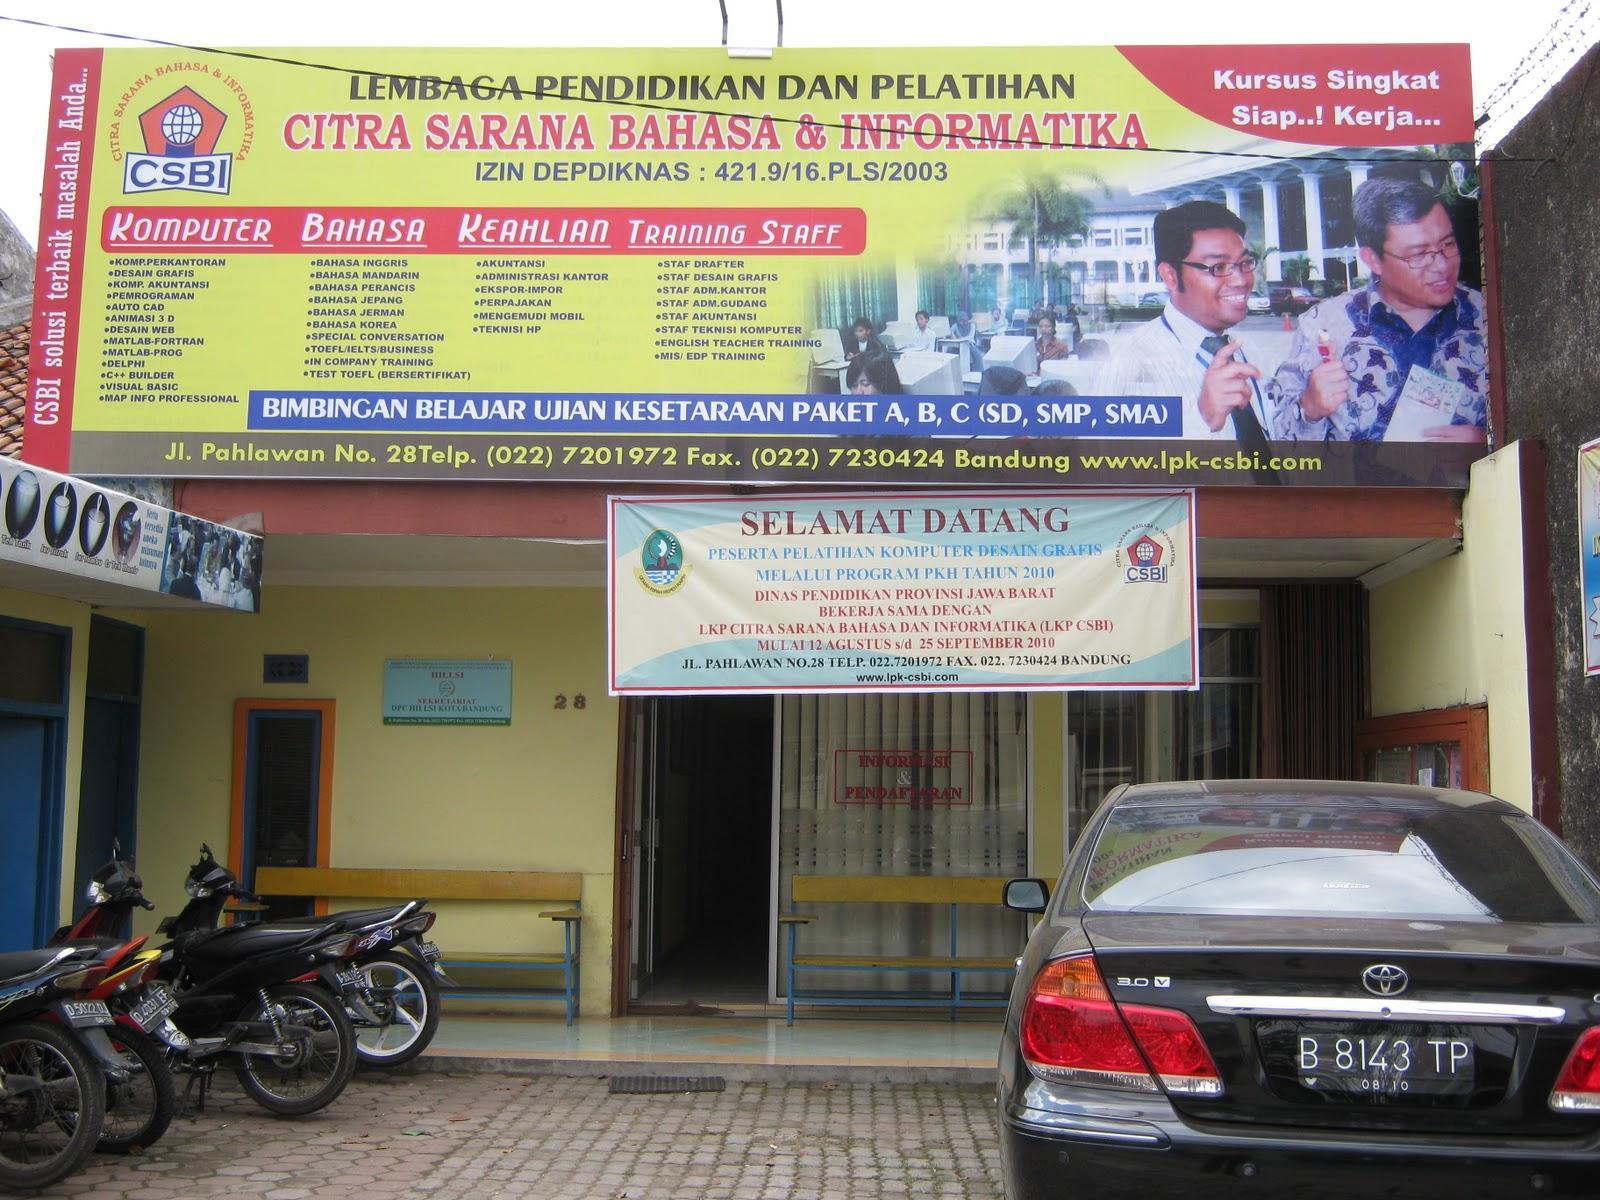 Tempat Kursus Komputer Di Daerah Bandung